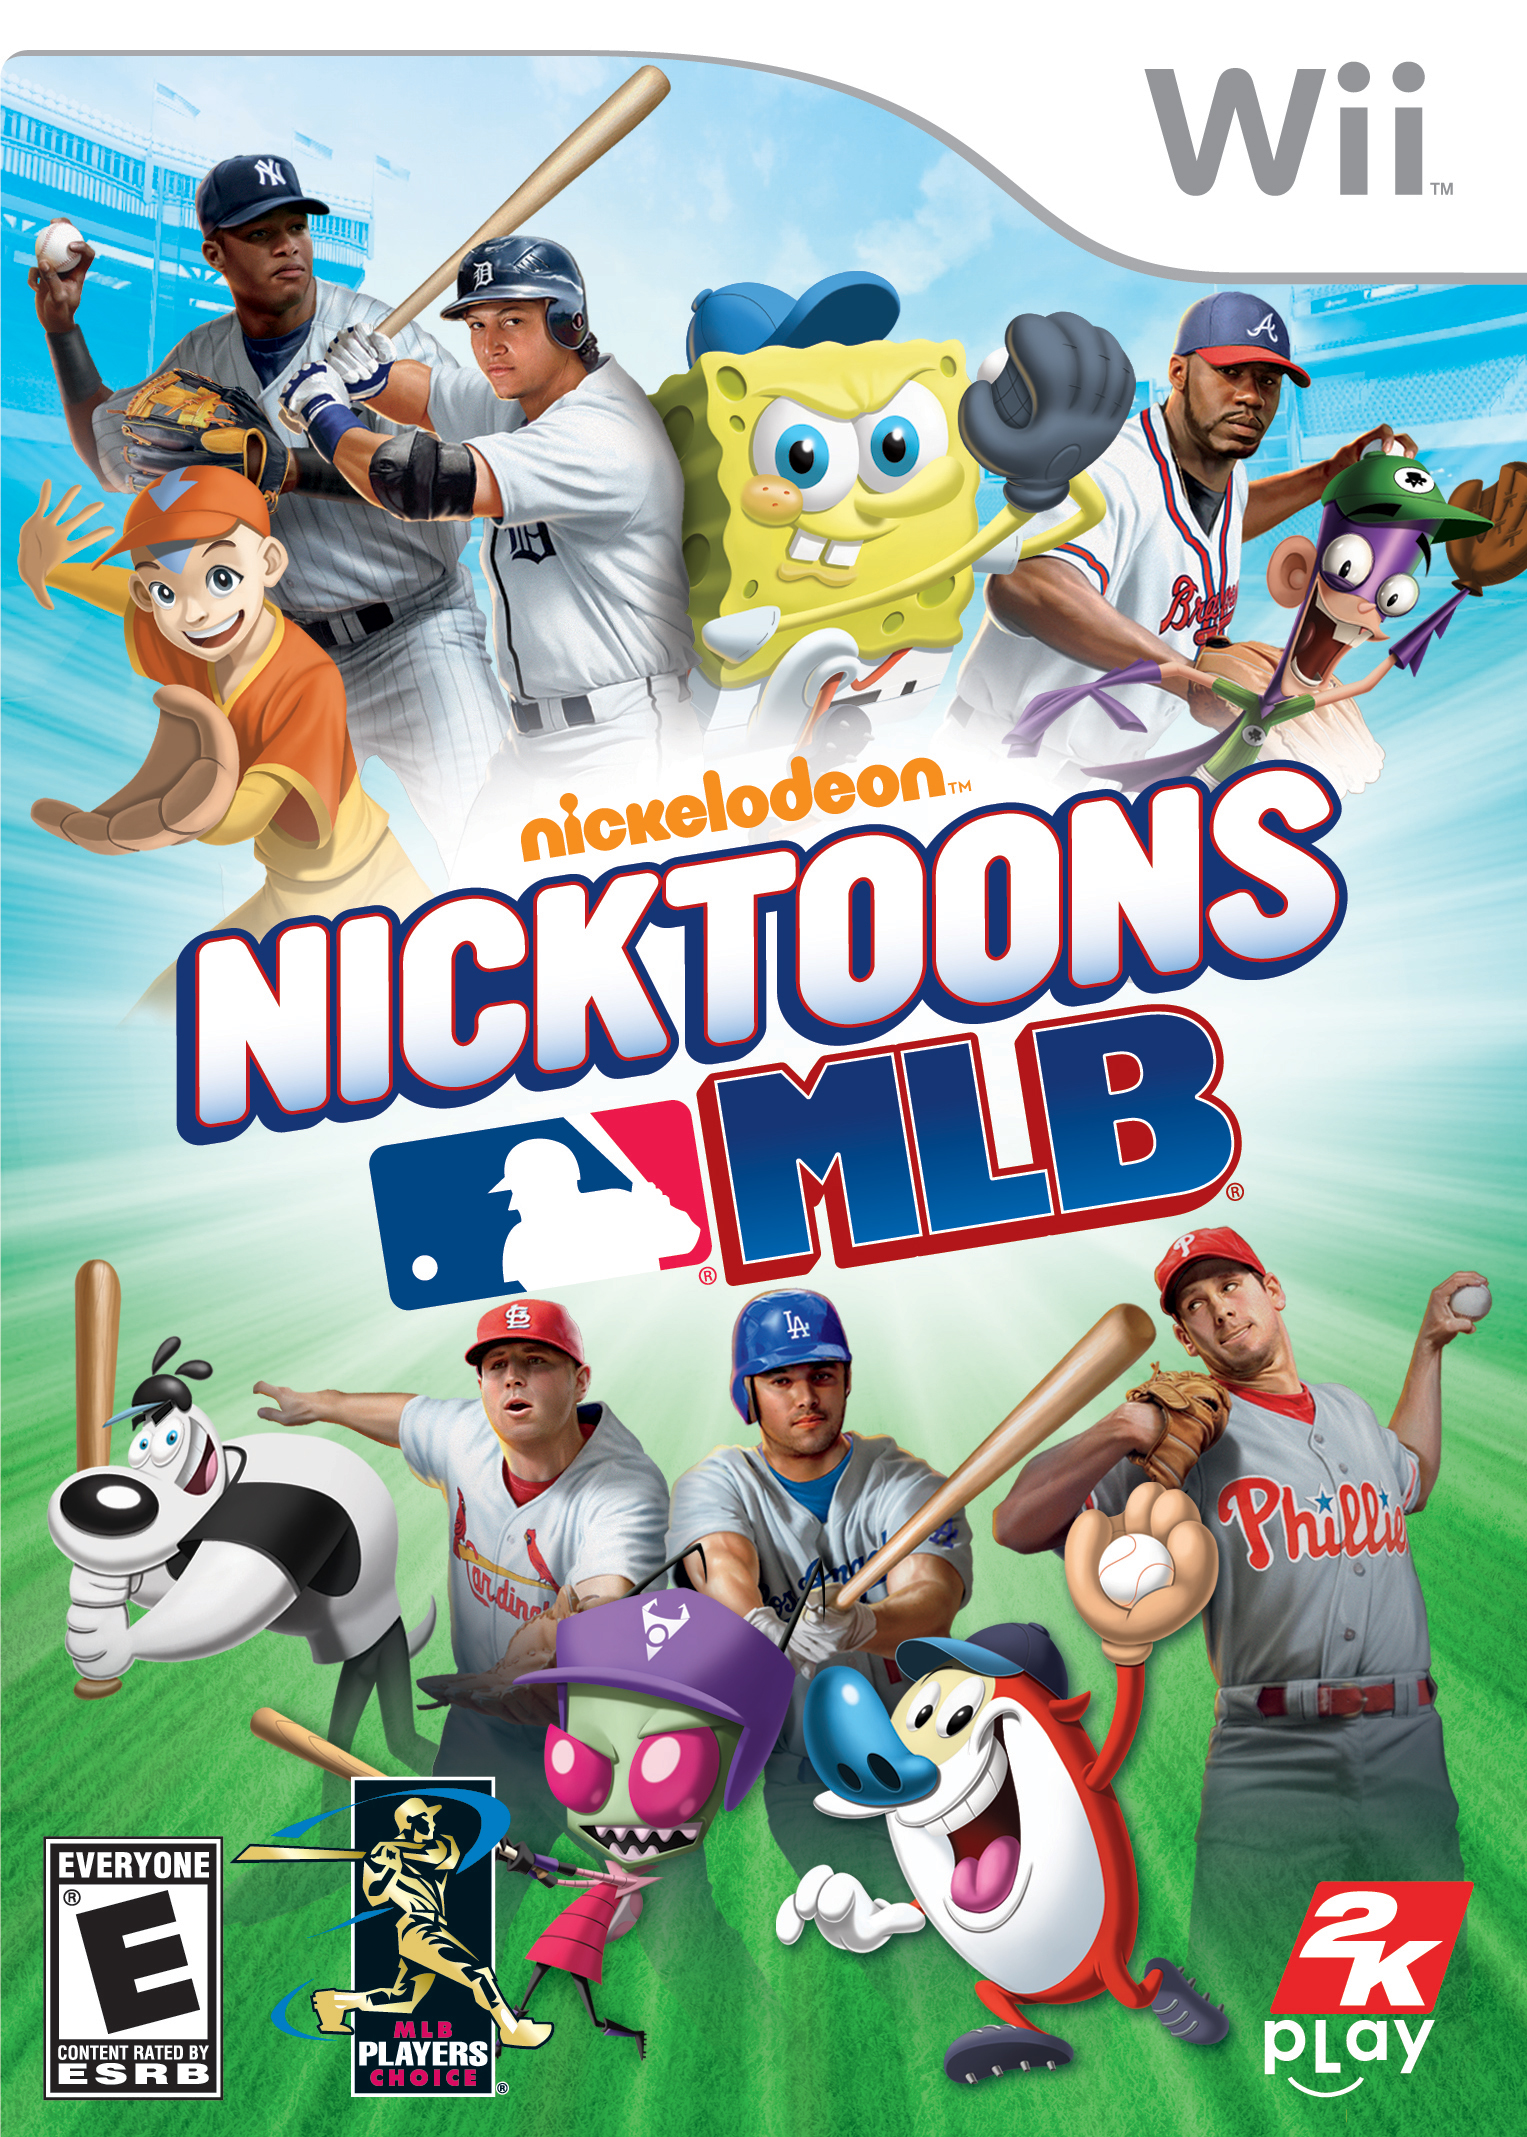 Wii Games List 2012 : Nicktoons mlb box wii na